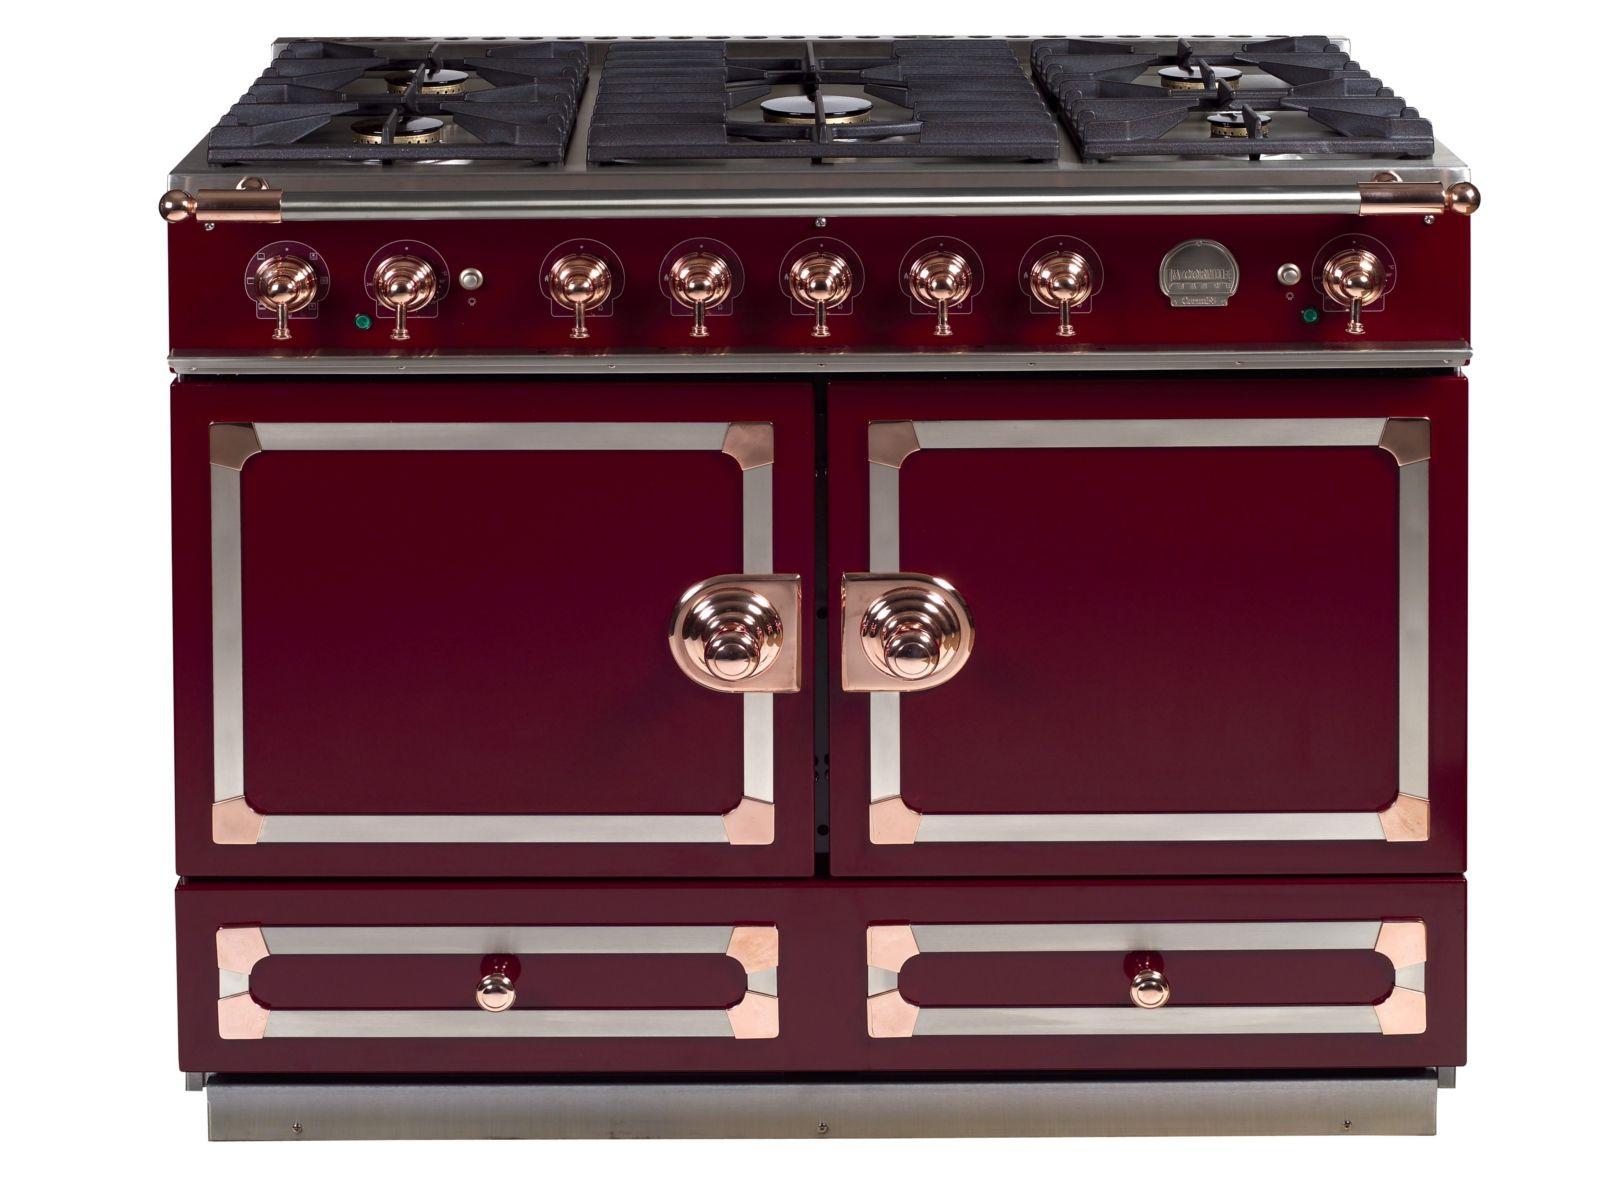 stainless steel cooker cornuf 110 by la cornue. Black Bedroom Furniture Sets. Home Design Ideas